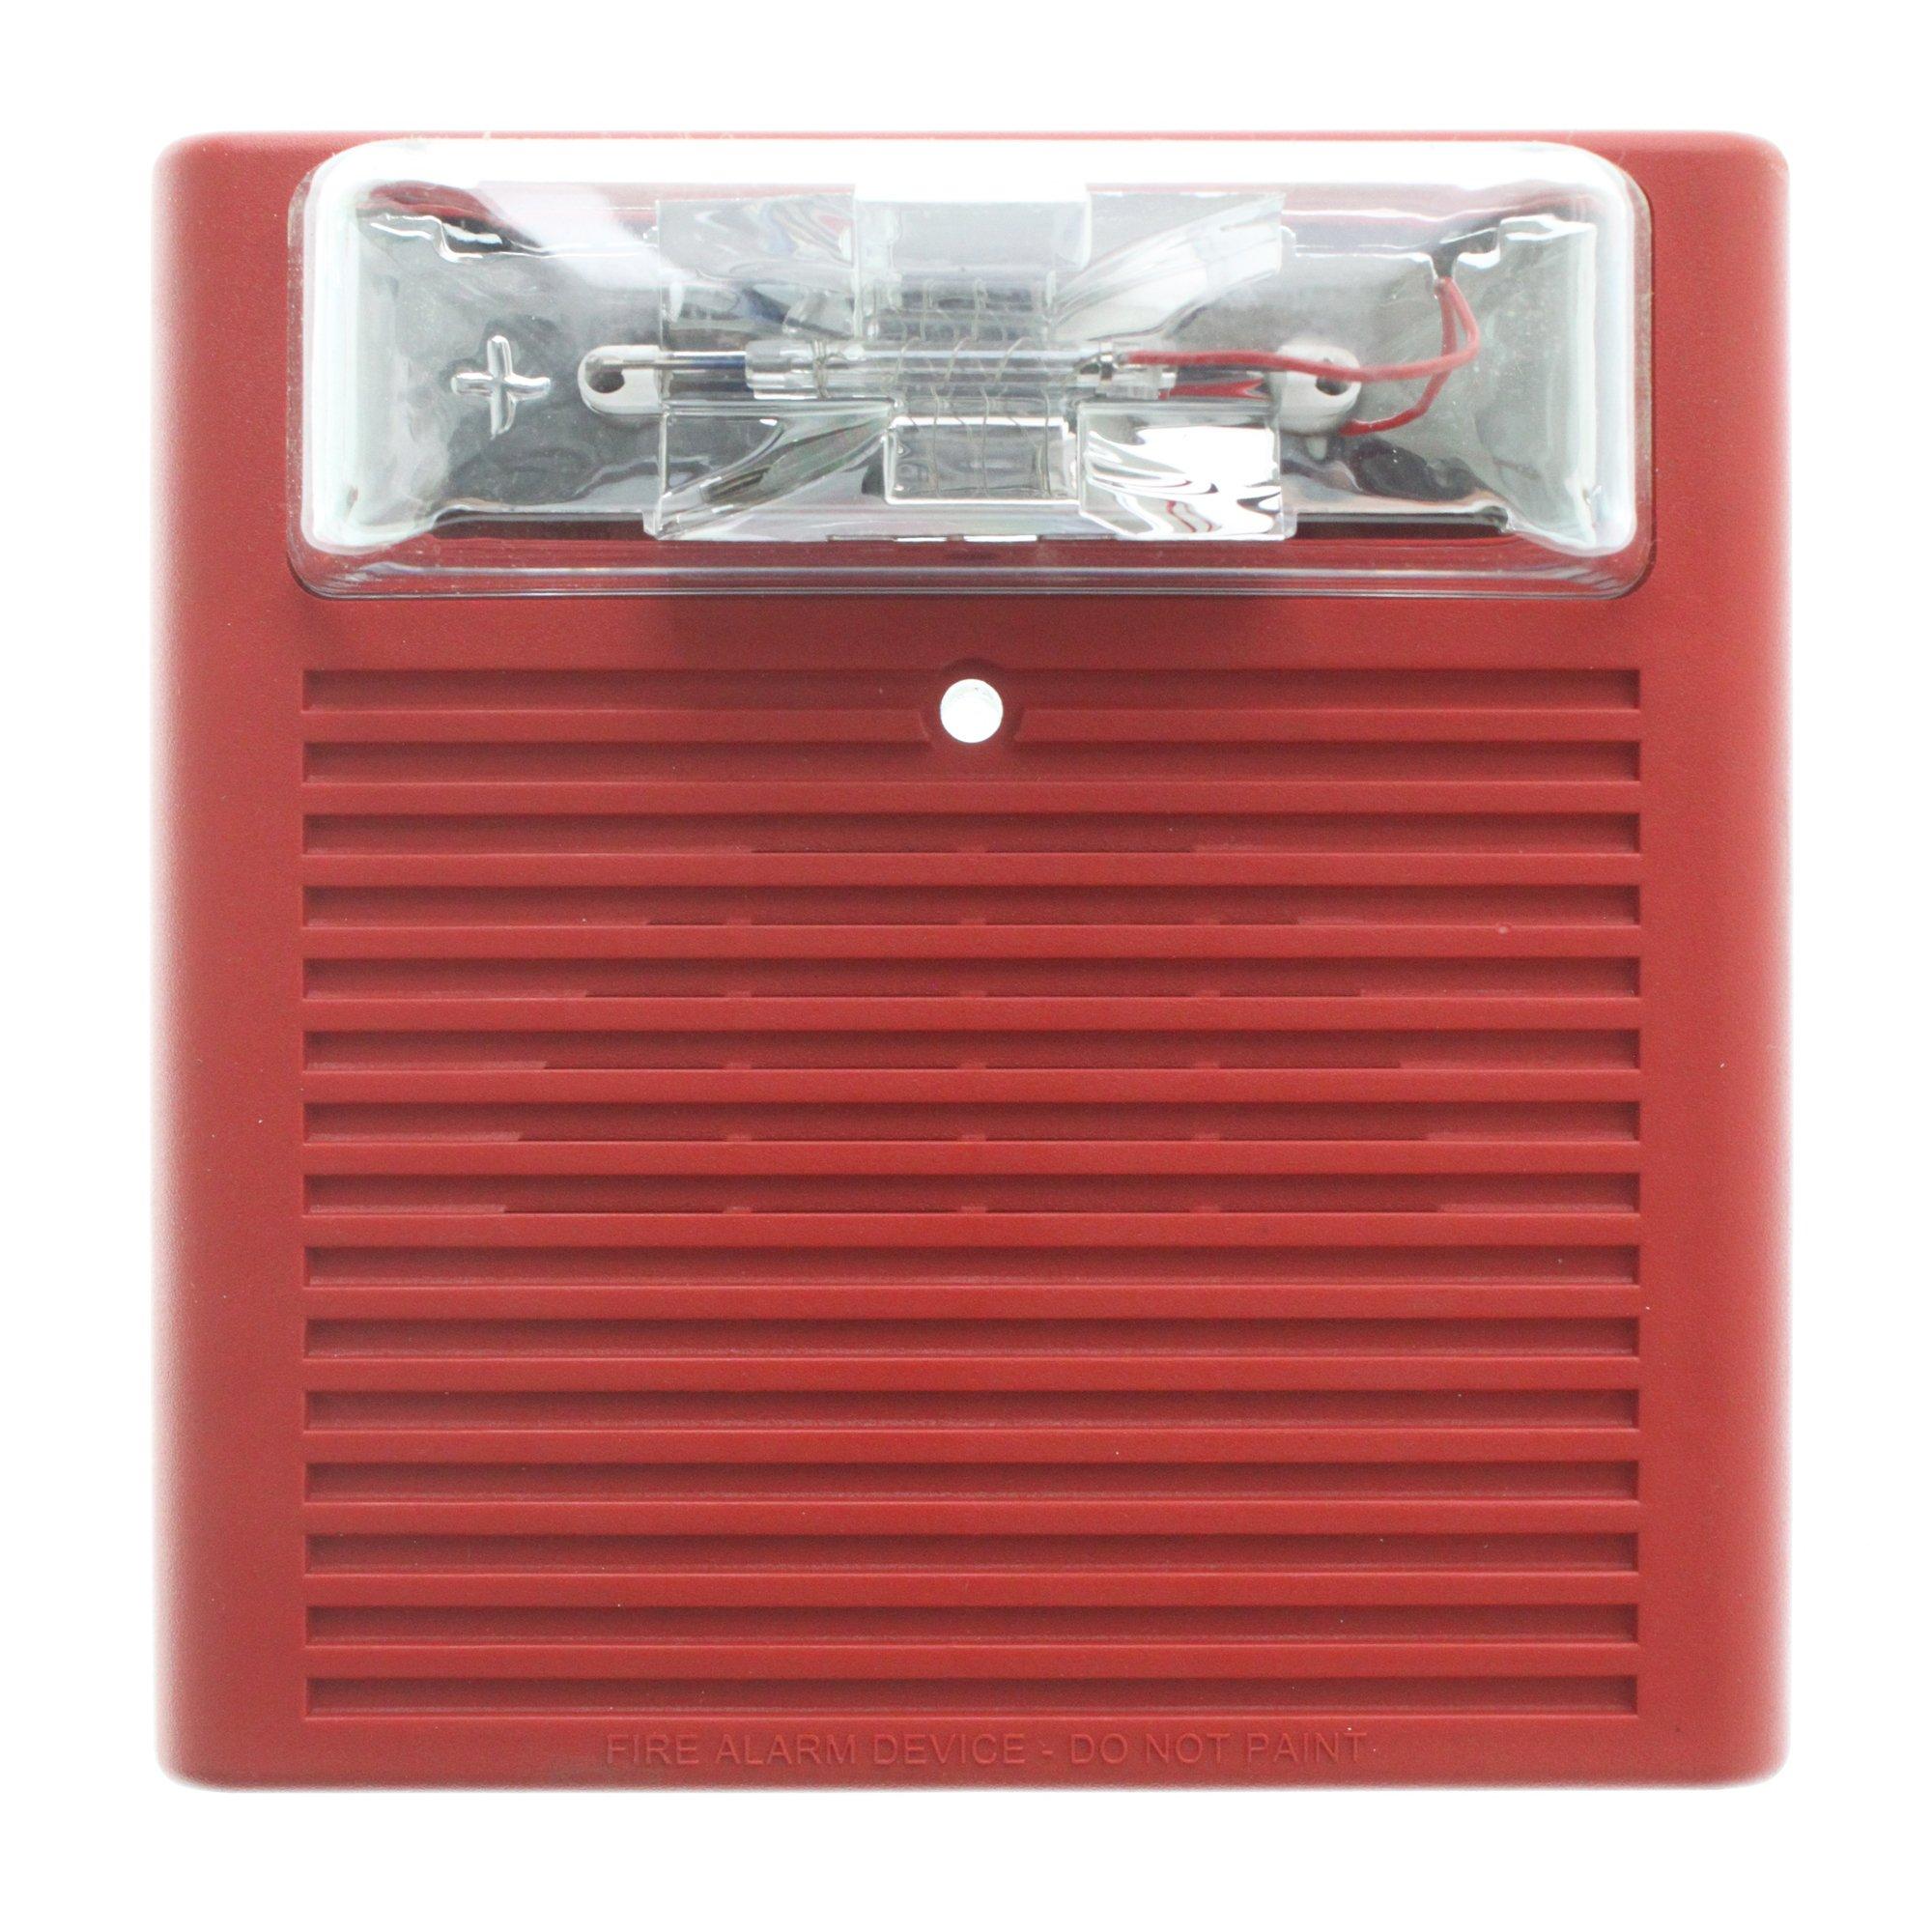 Wheelock AS-24MCW-FR 129024 Audible Strobe, Multi-Candela, Wall Mt, 24-Vdc, Red